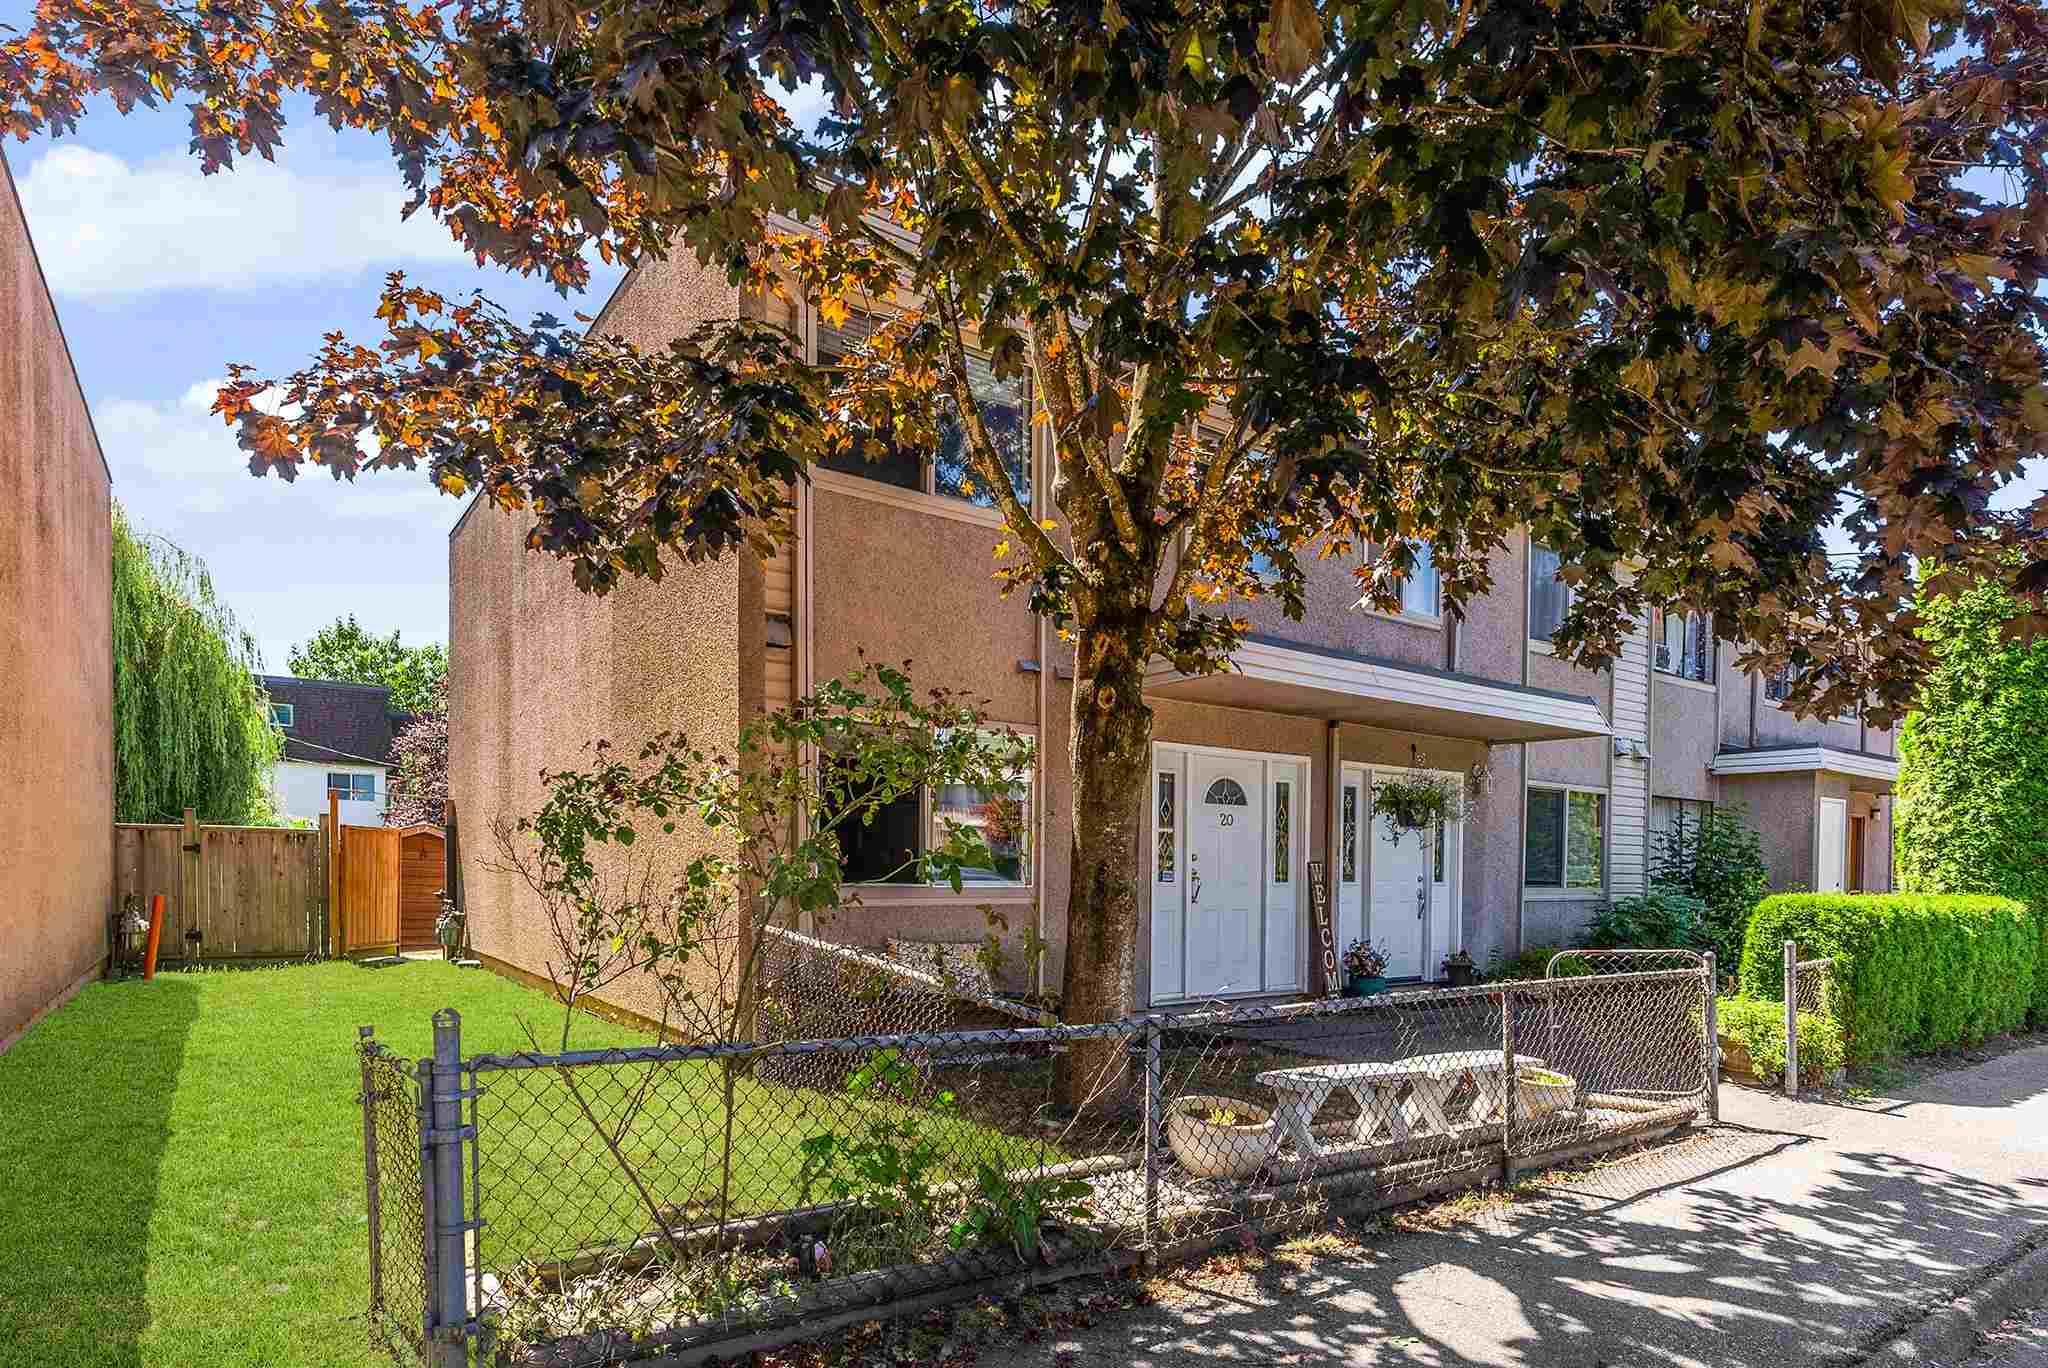 20 27090 32 AVENUE - Aldergrove Langley Townhouse for sale, 3 Bedrooms (R2604693) - #1